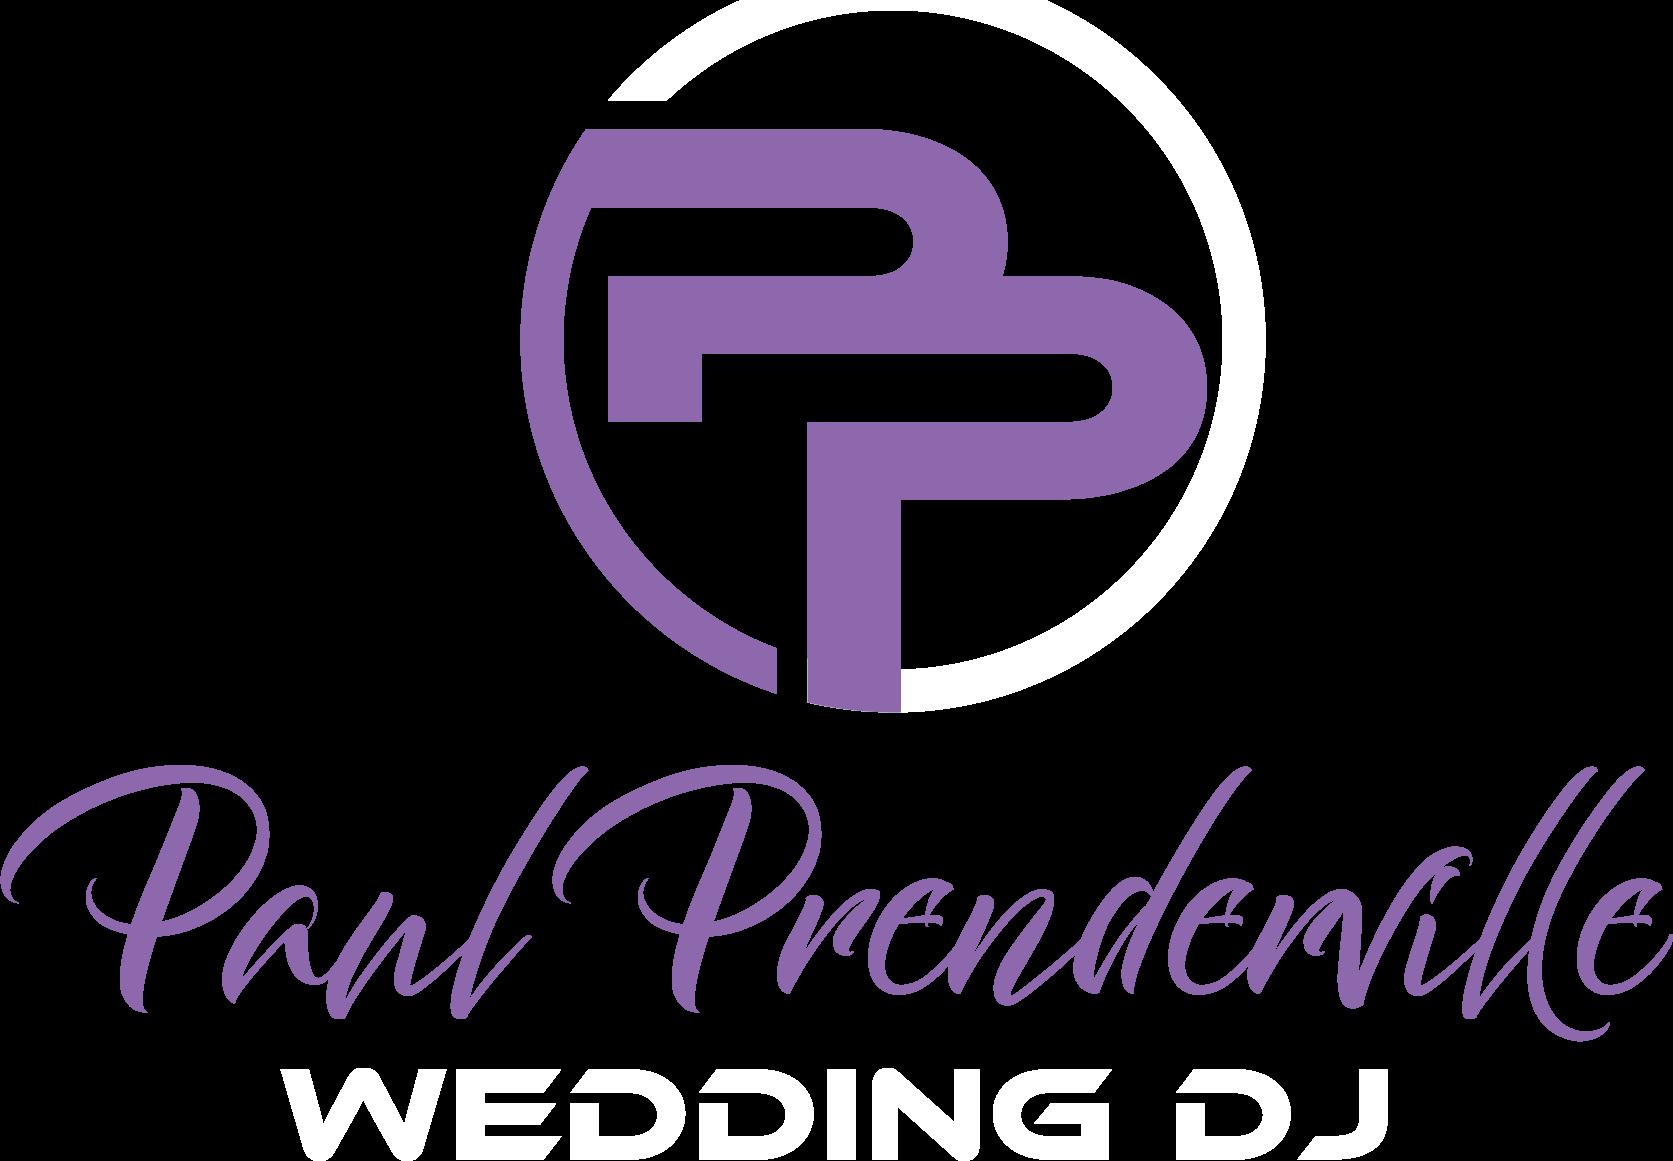 Paul Prenderville Wedding DJ